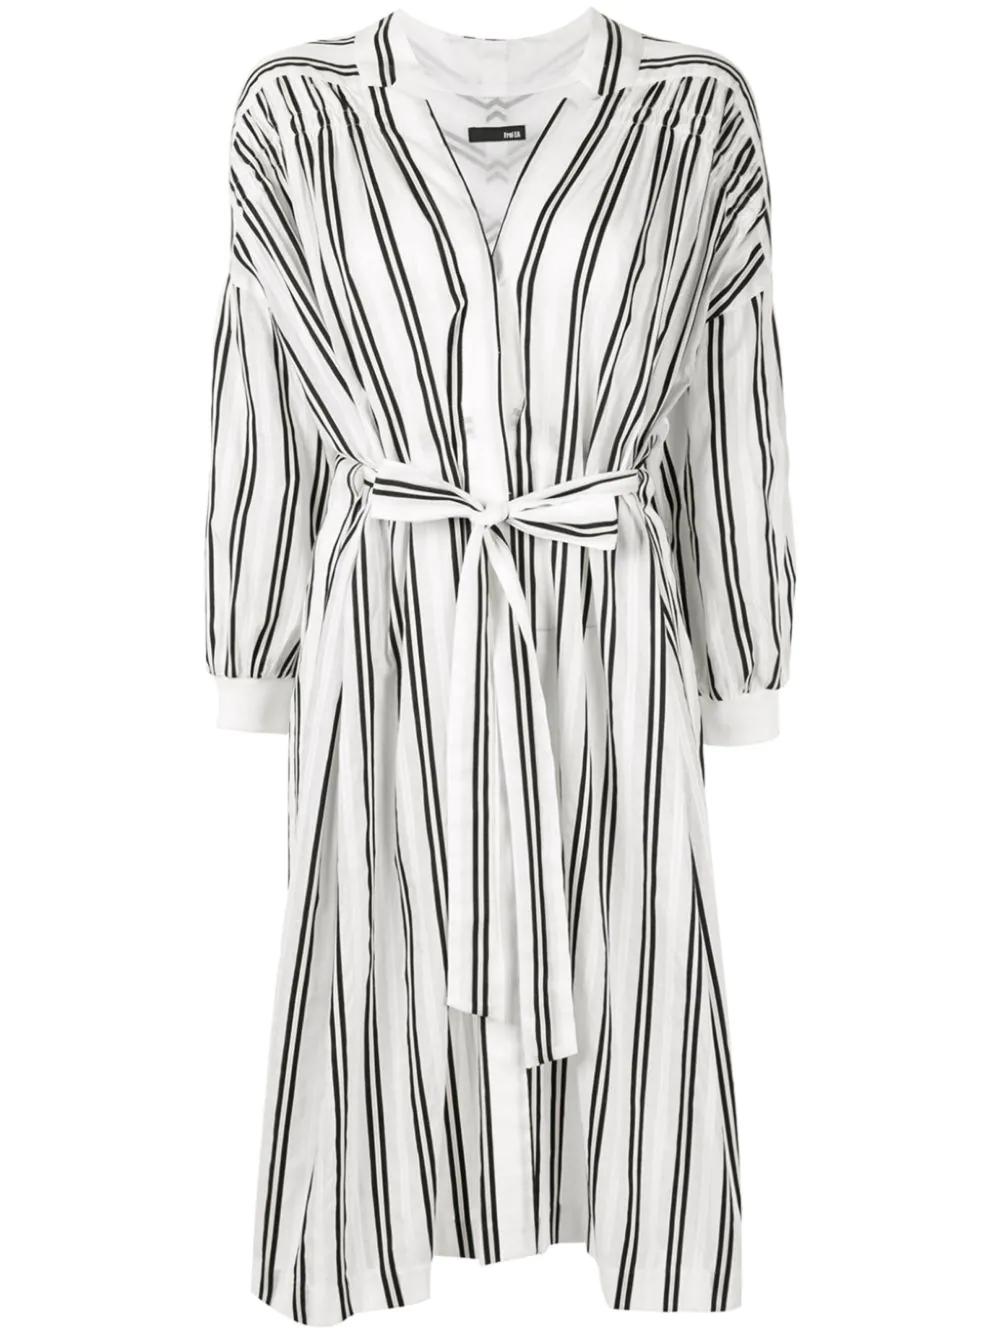 Frei Ea | платье-рубашка в полоску | Clouty